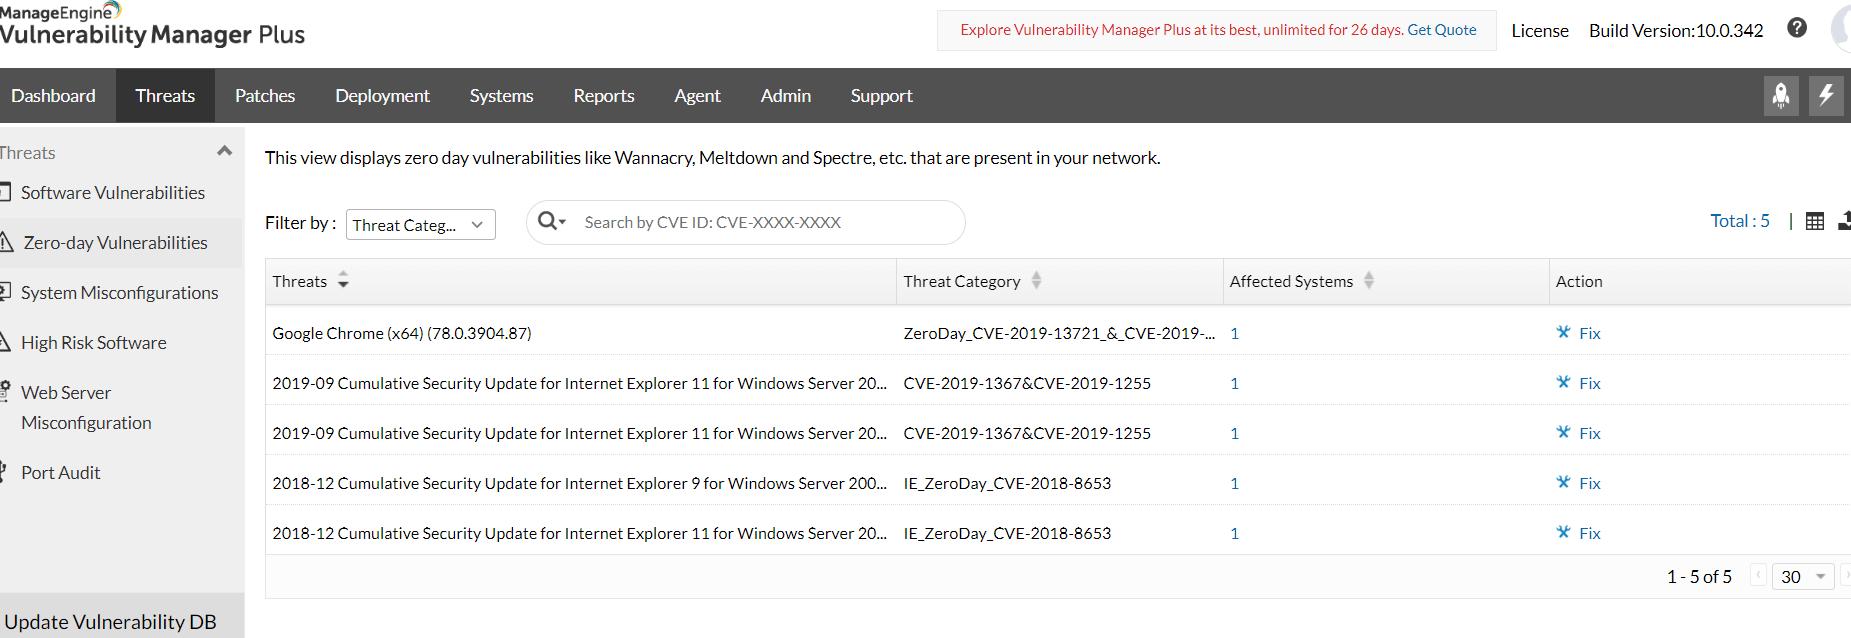 zero-day exploit - ManageEngine Vulnerability Manager Plus